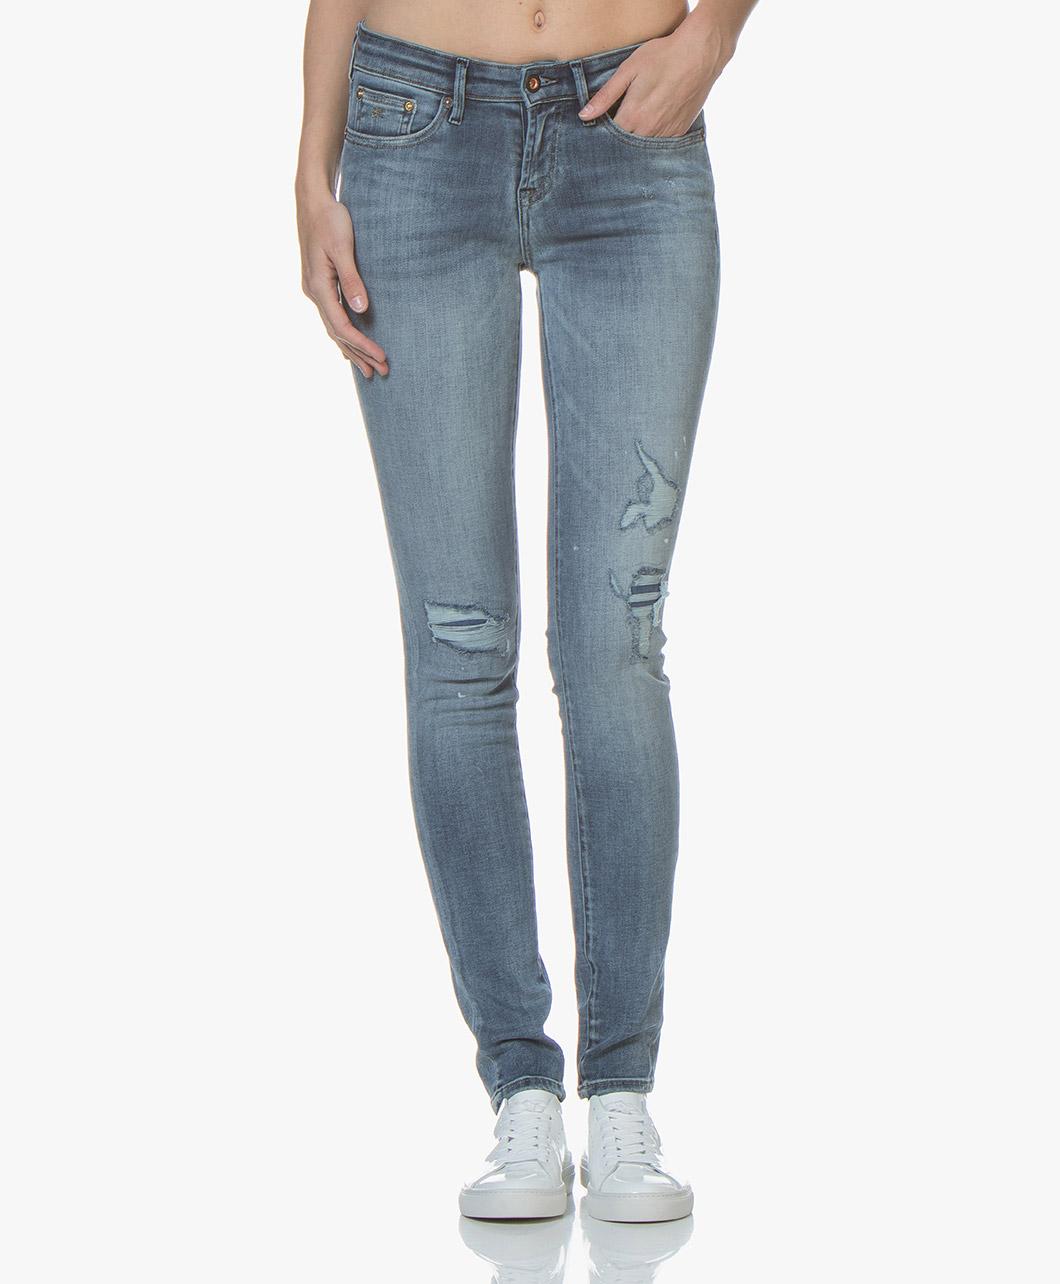 Afbeelding van Denham Jeans Middenblauw Sharp Skinny Fit